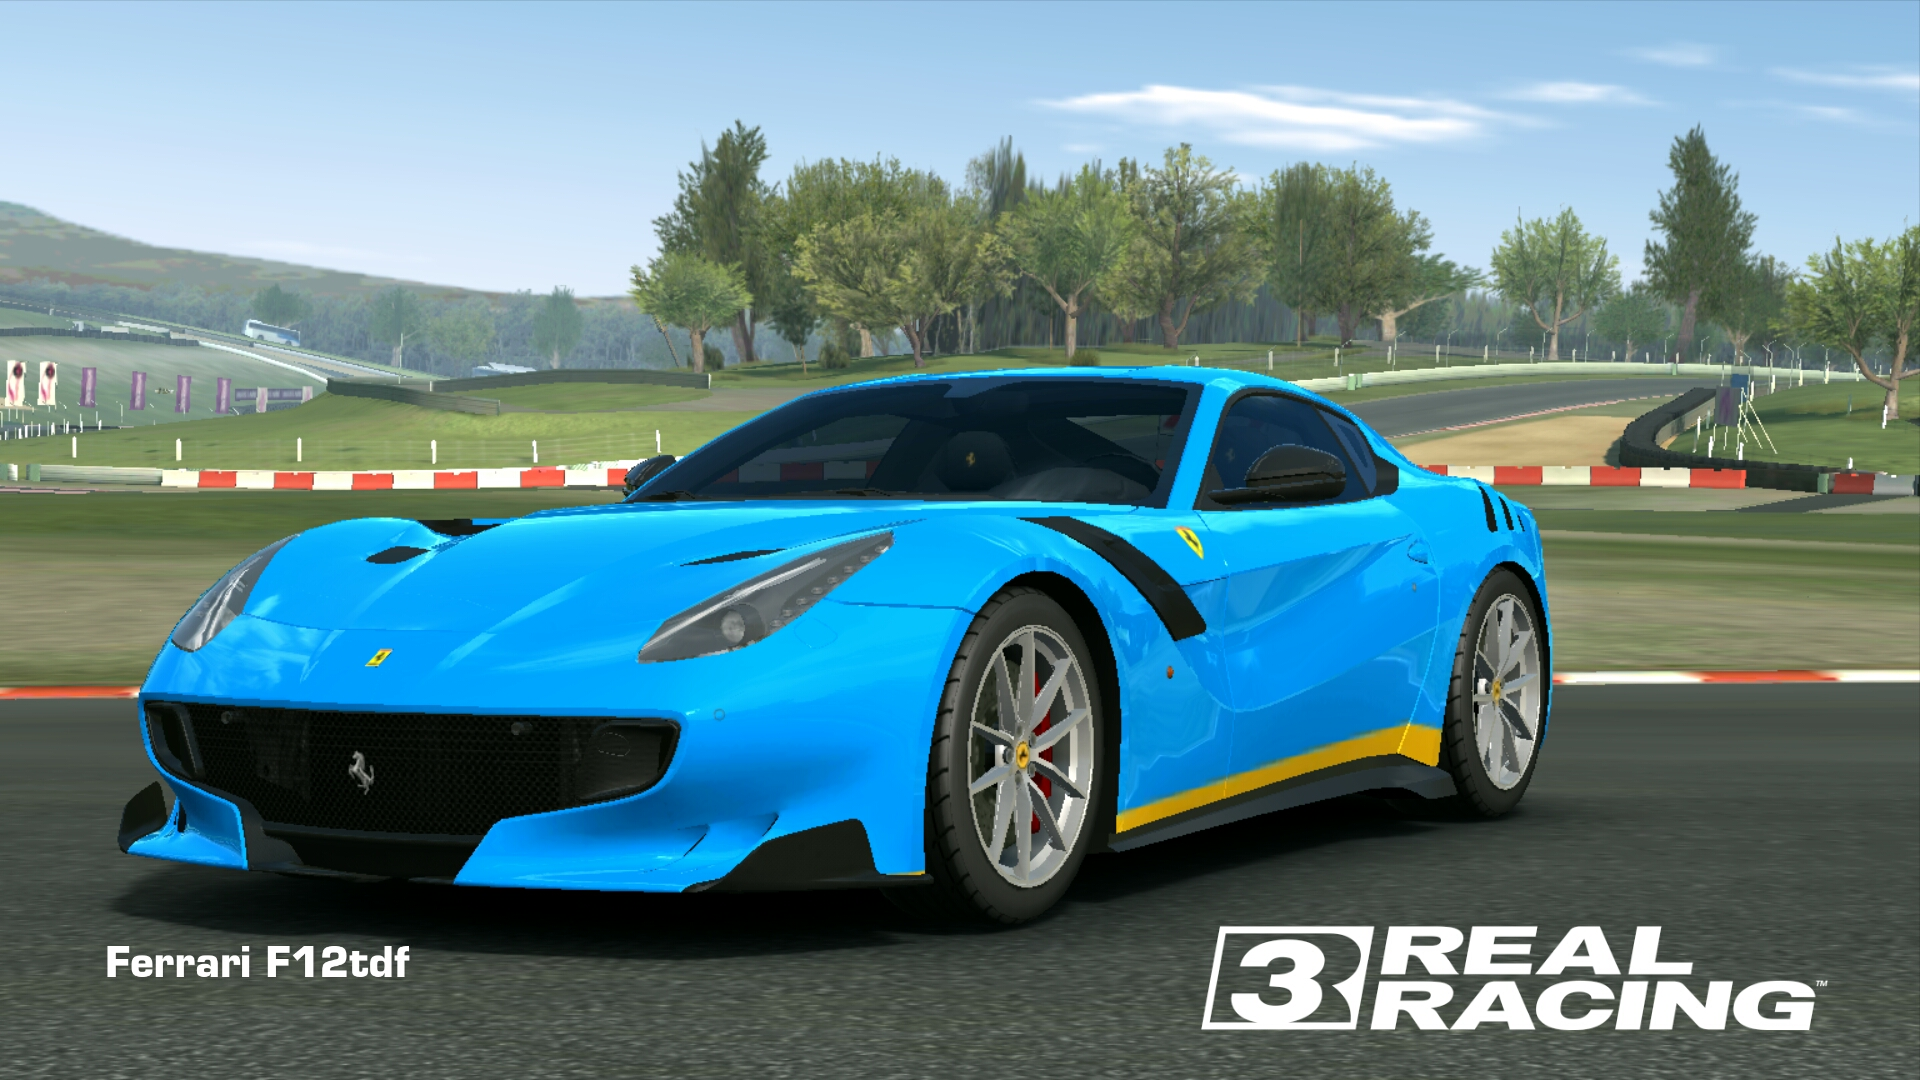 Quanto Costa Ferrari F12Tdf